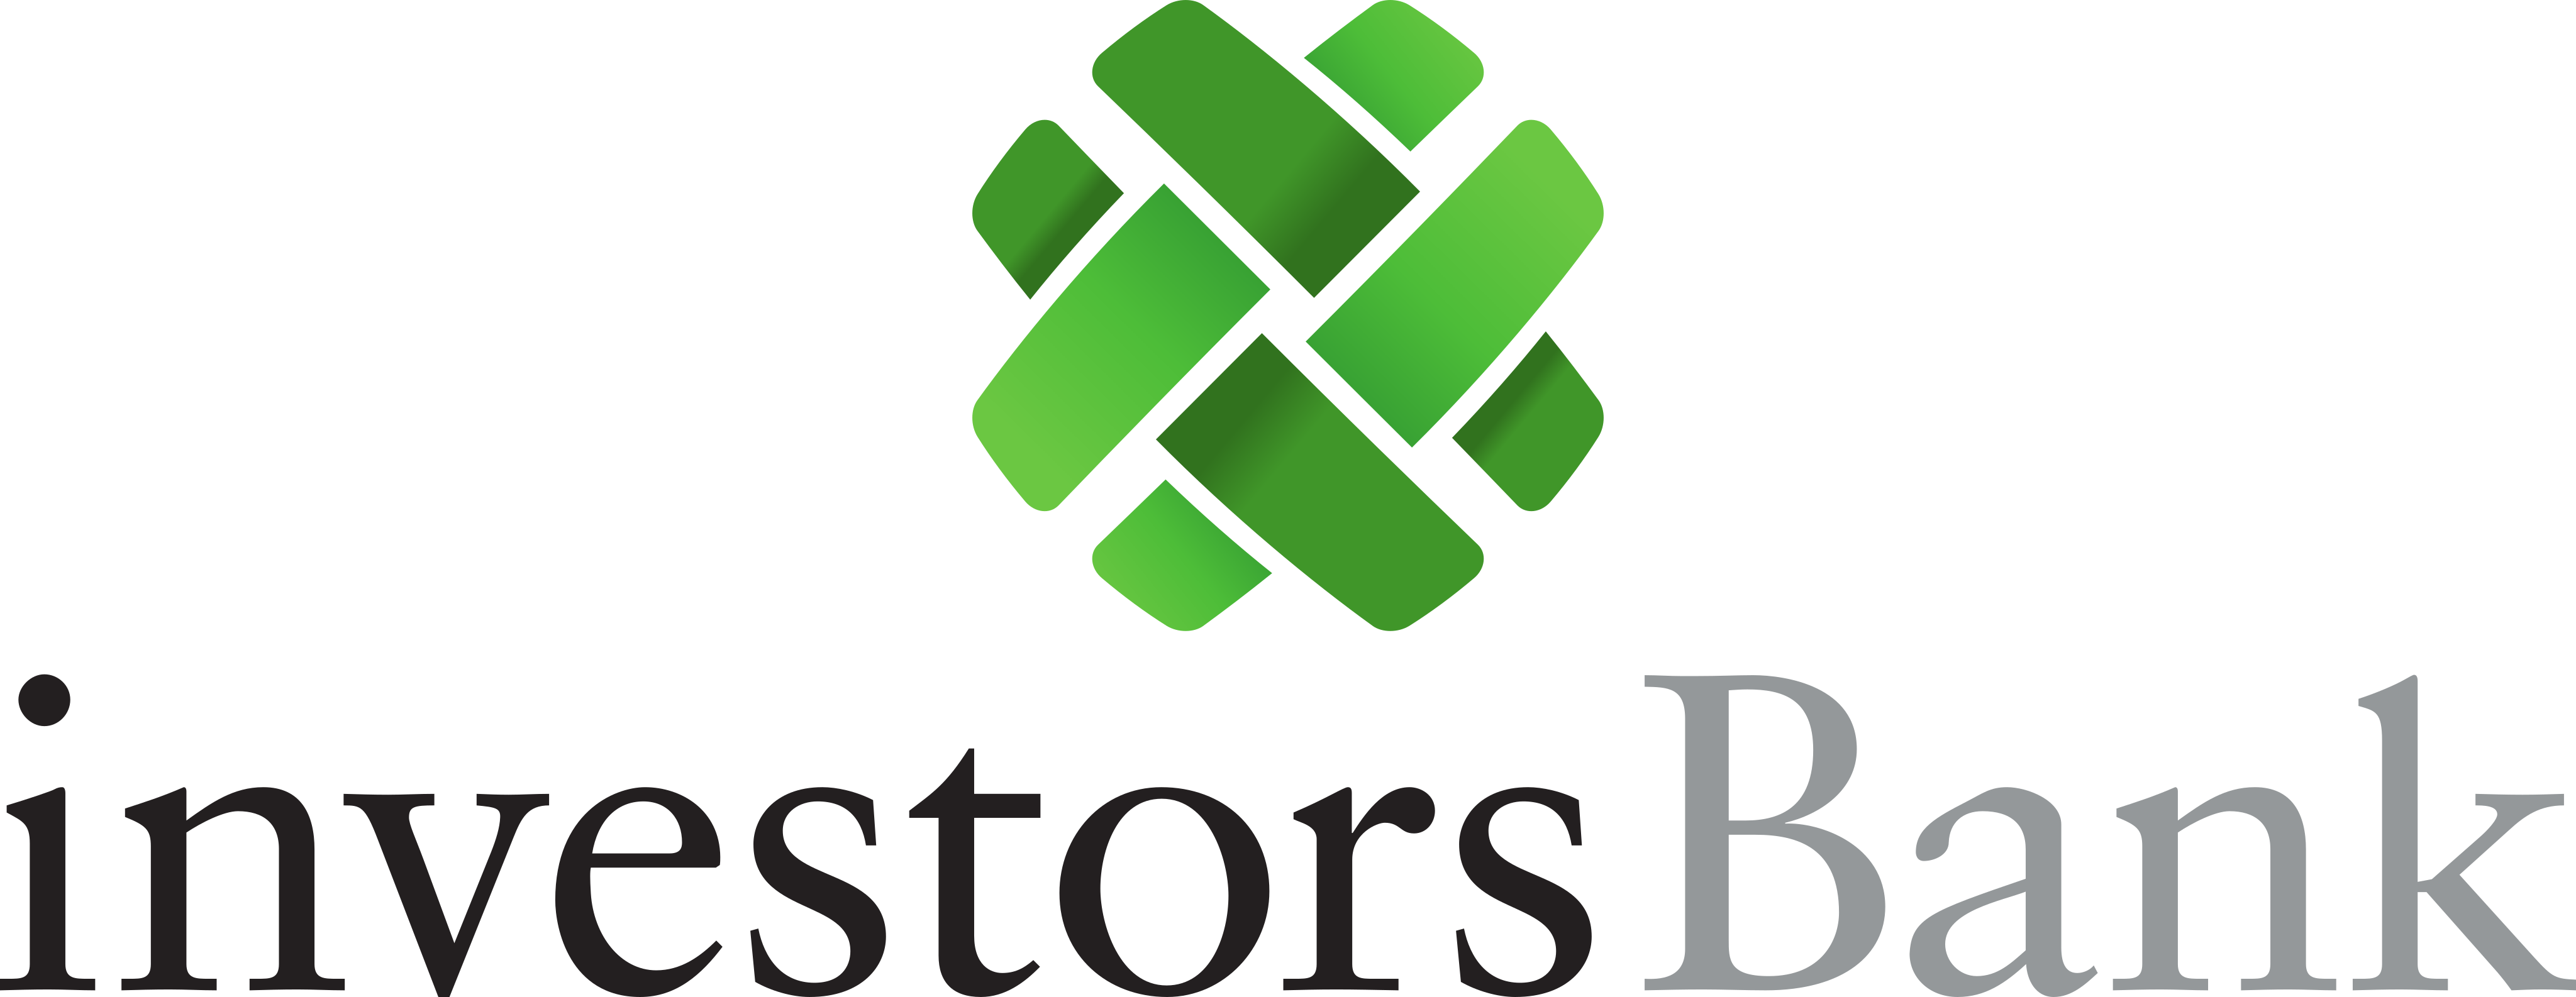 investors bank logo 1 - Investors Bank Logo